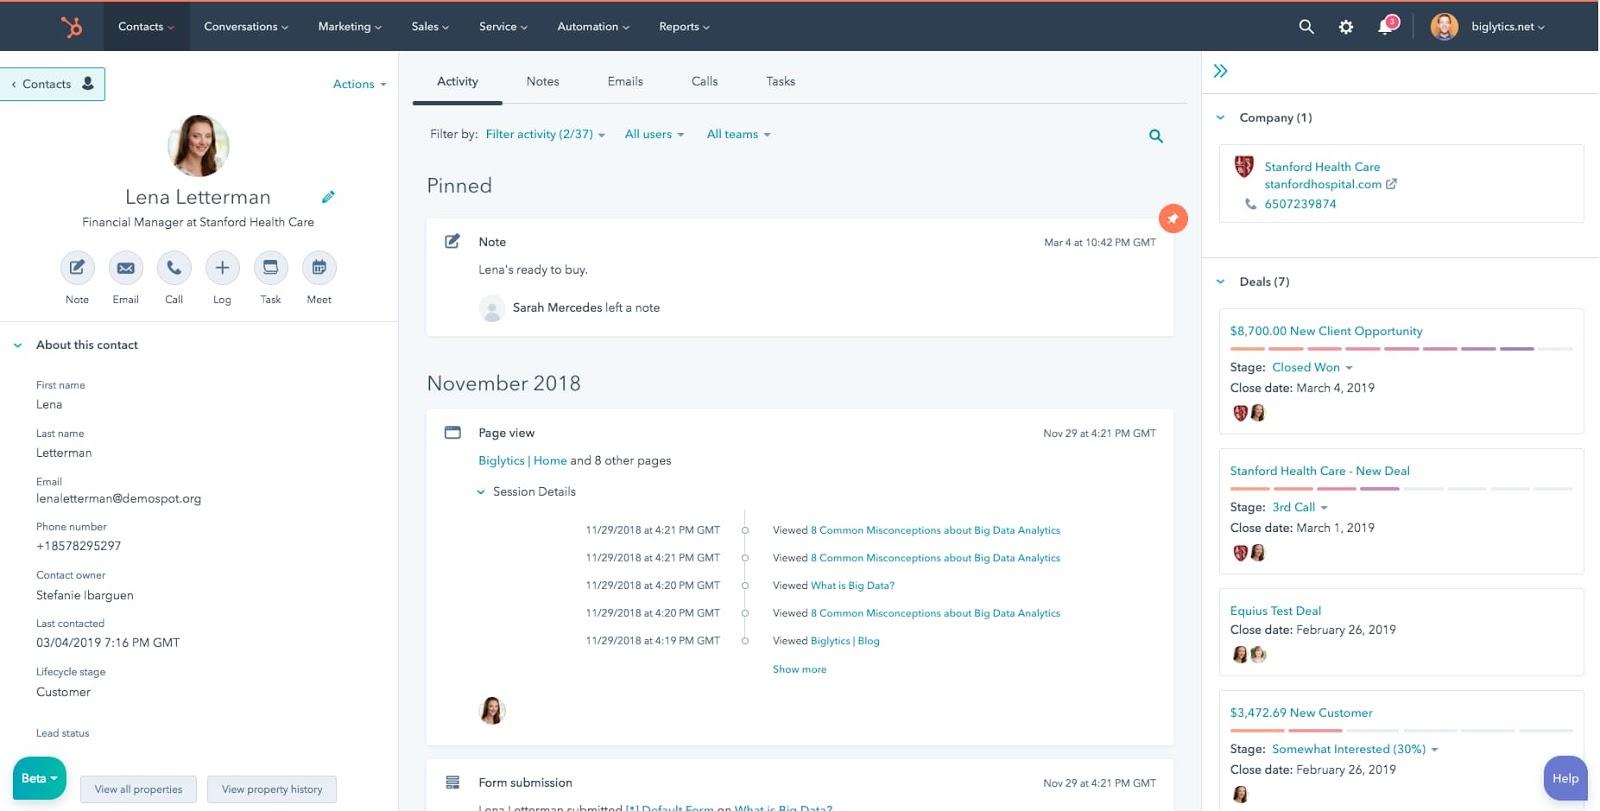 HubSpot CRM - Contact Management Software Solutions for Nonprofits